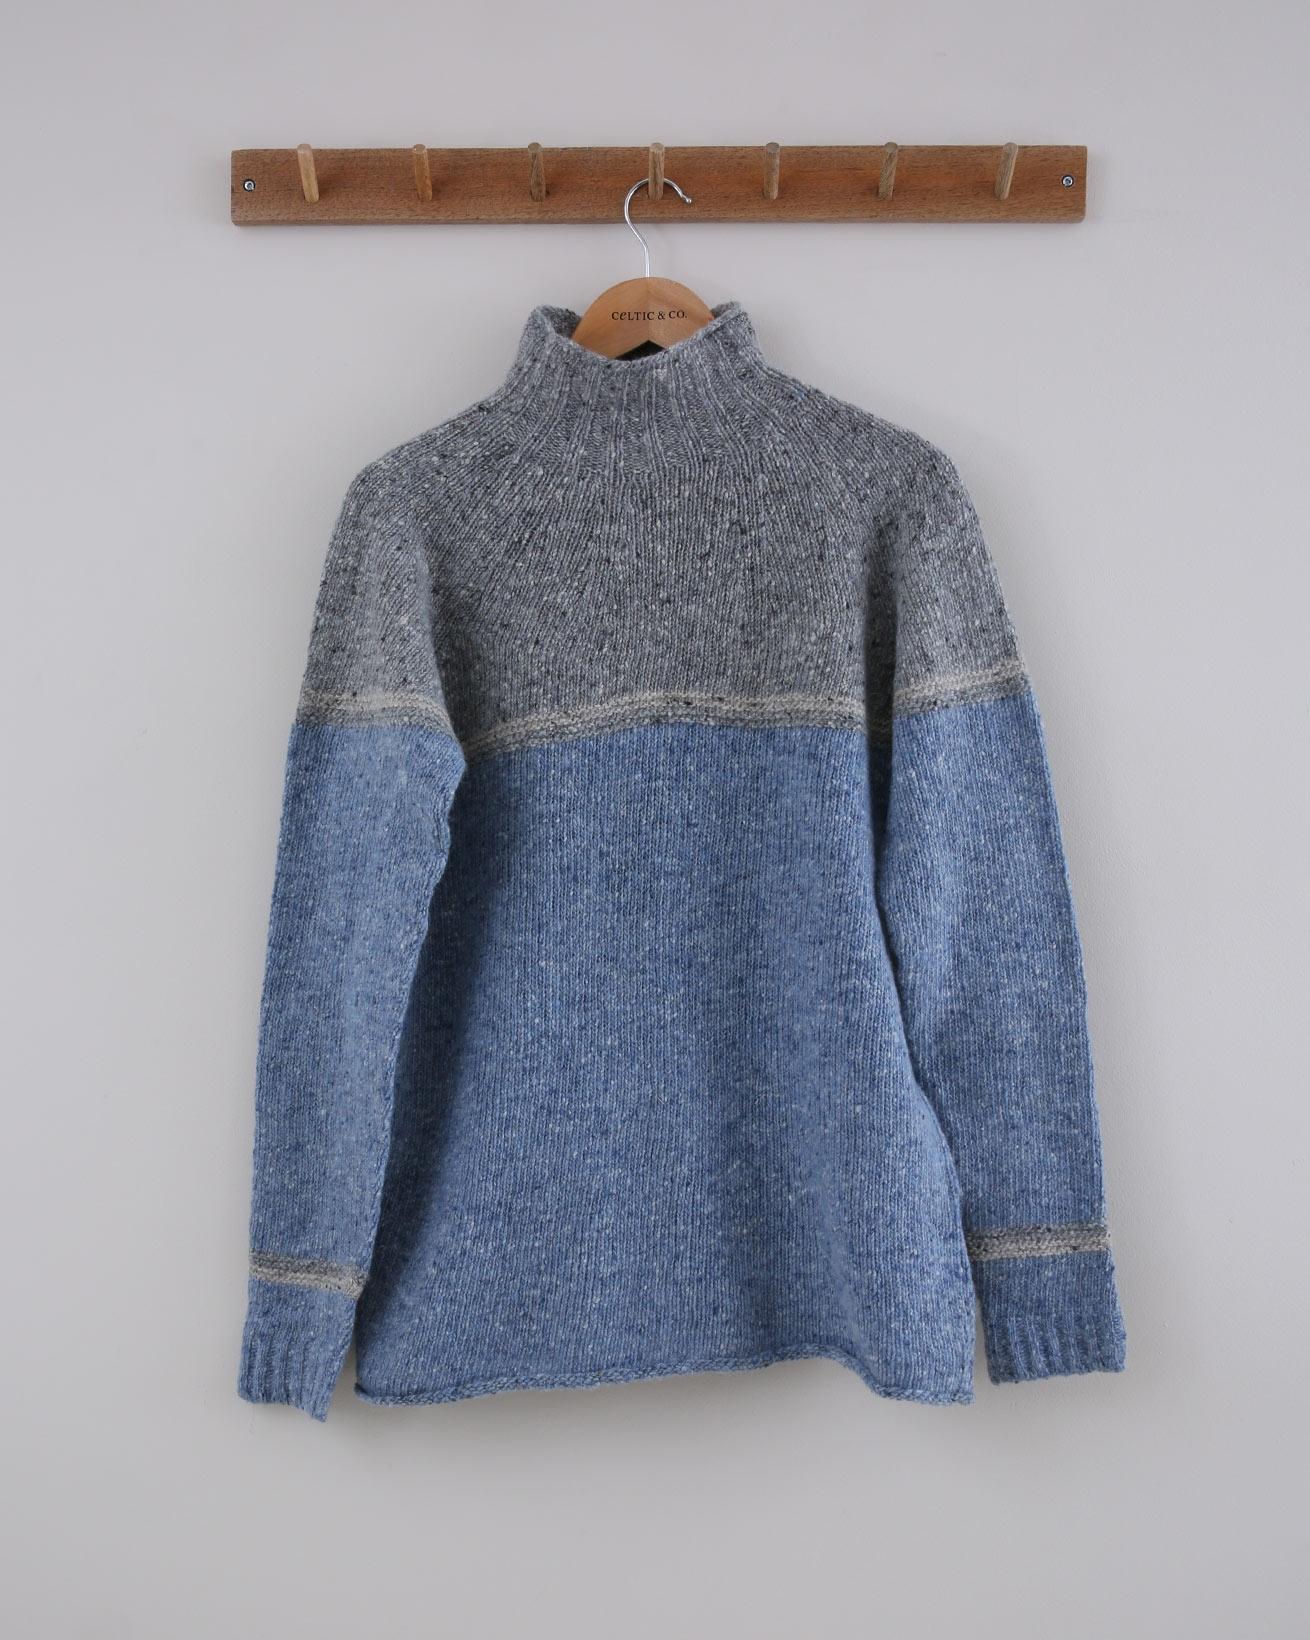 Flecked Funnel Neck - Size Small - Grey & Blue Colourblock - 1506